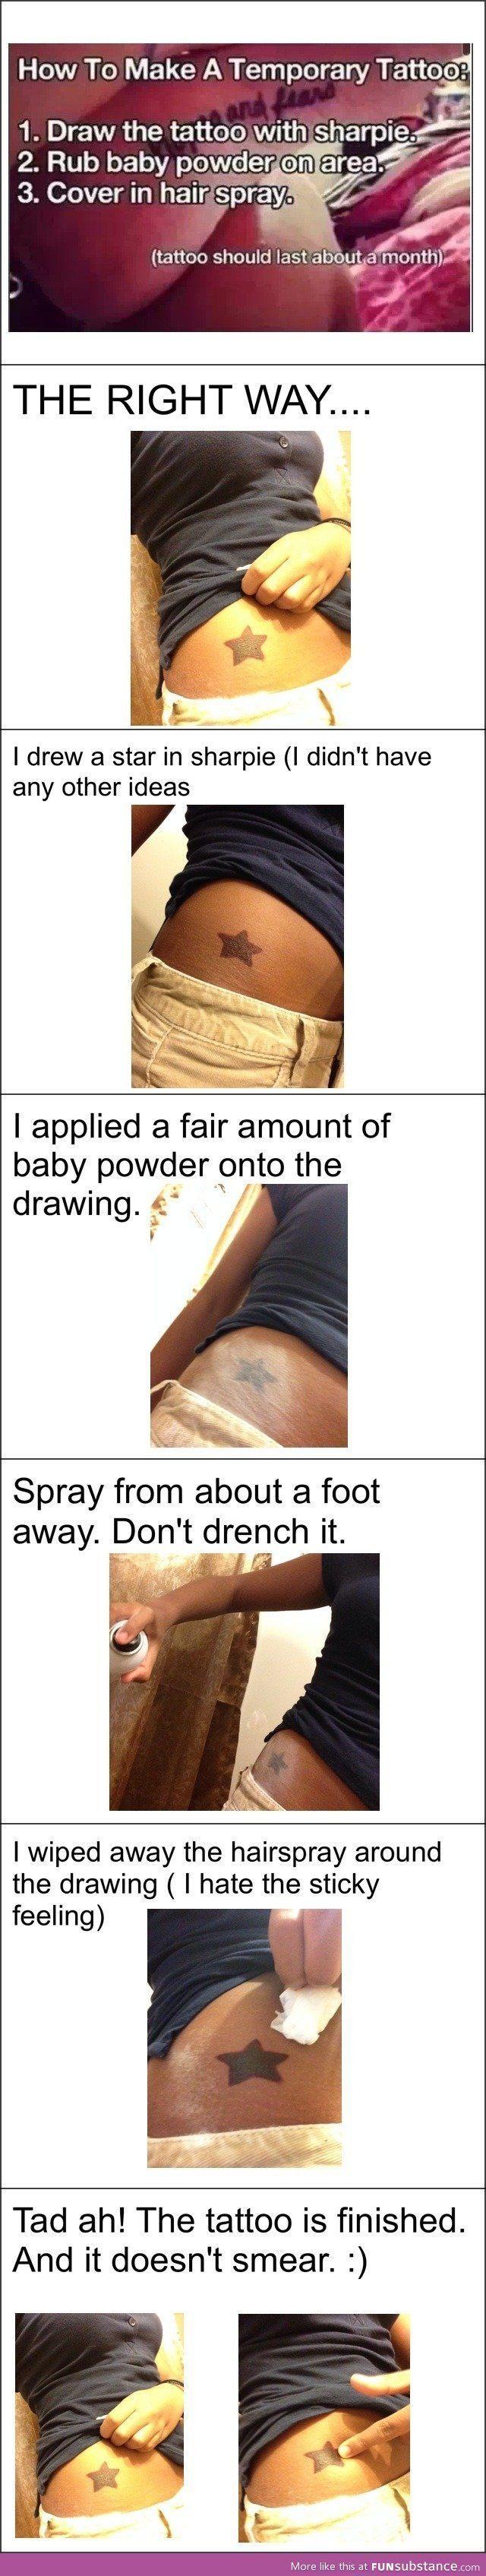 How To Make Sharpie Tattoos Last : sharpie, tattoos, Sharpie, Tattoo, Lasts, Month, Tattoos,, Temporary